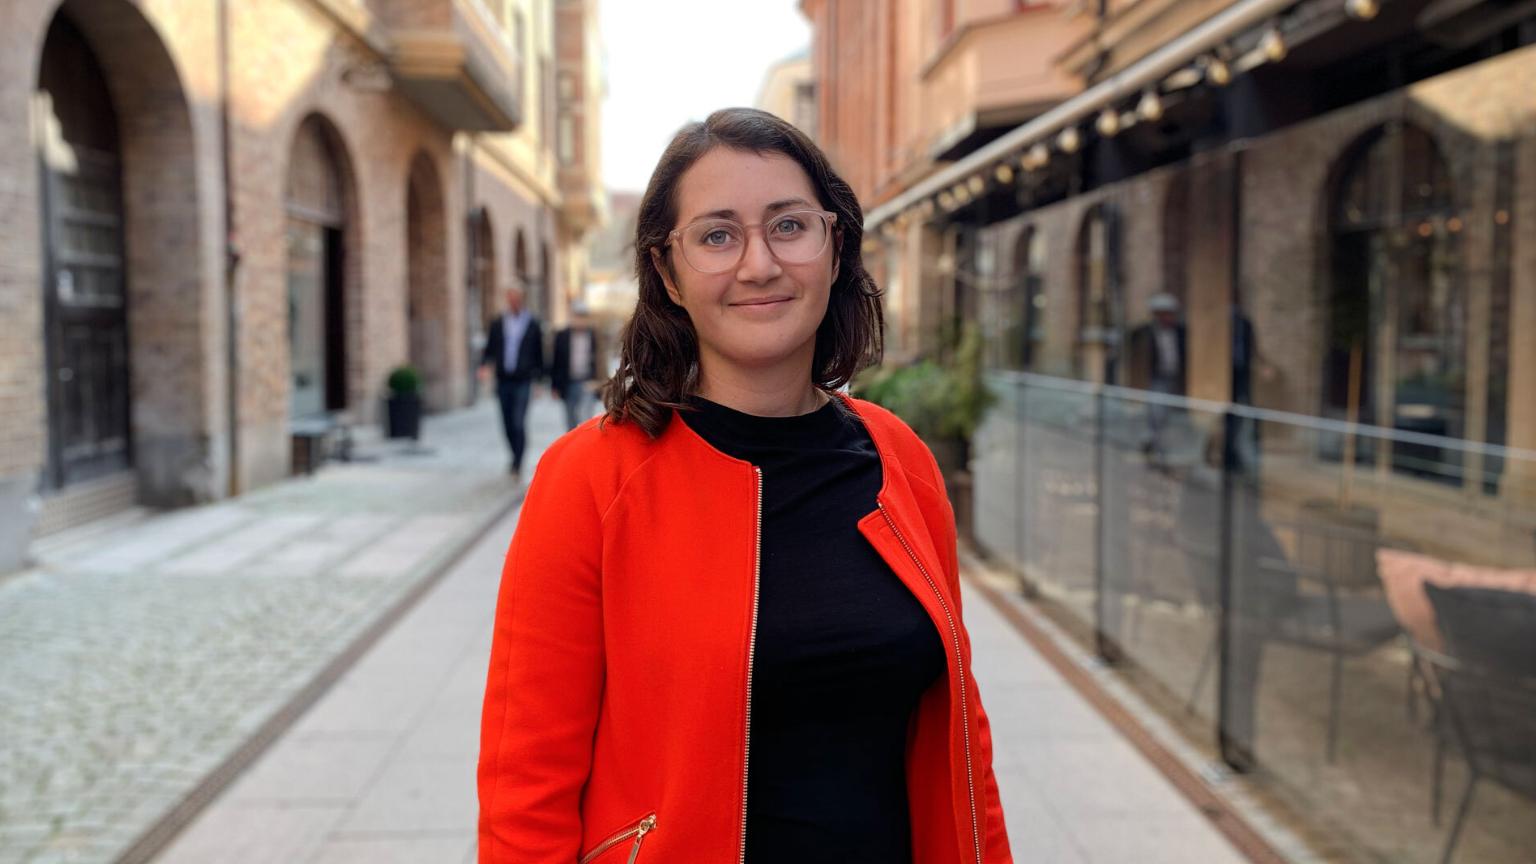 Caroline Lundblad